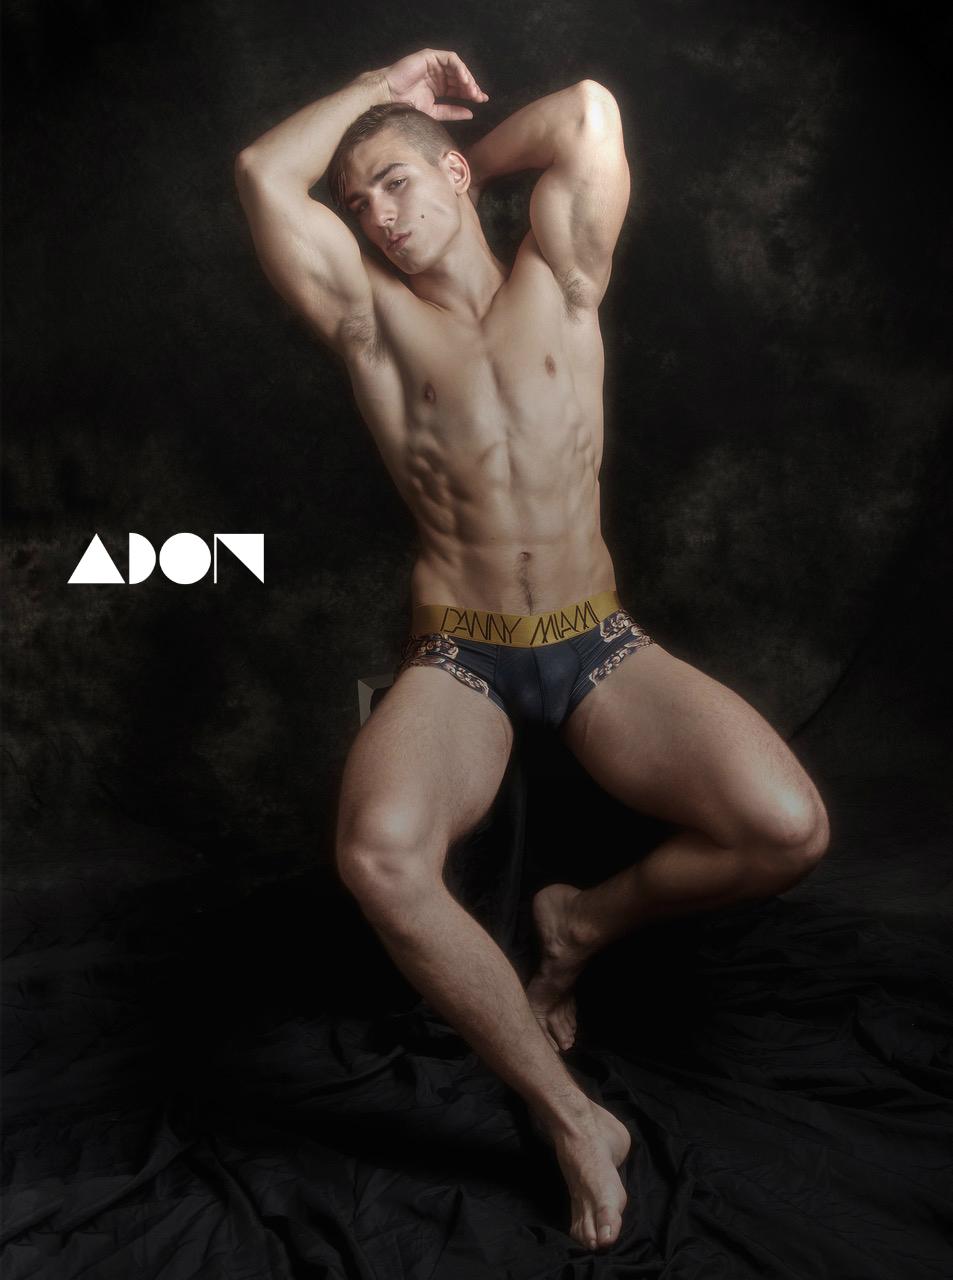 Adon Exclusive: Model Dragan Pecin By Paul Jamnicky